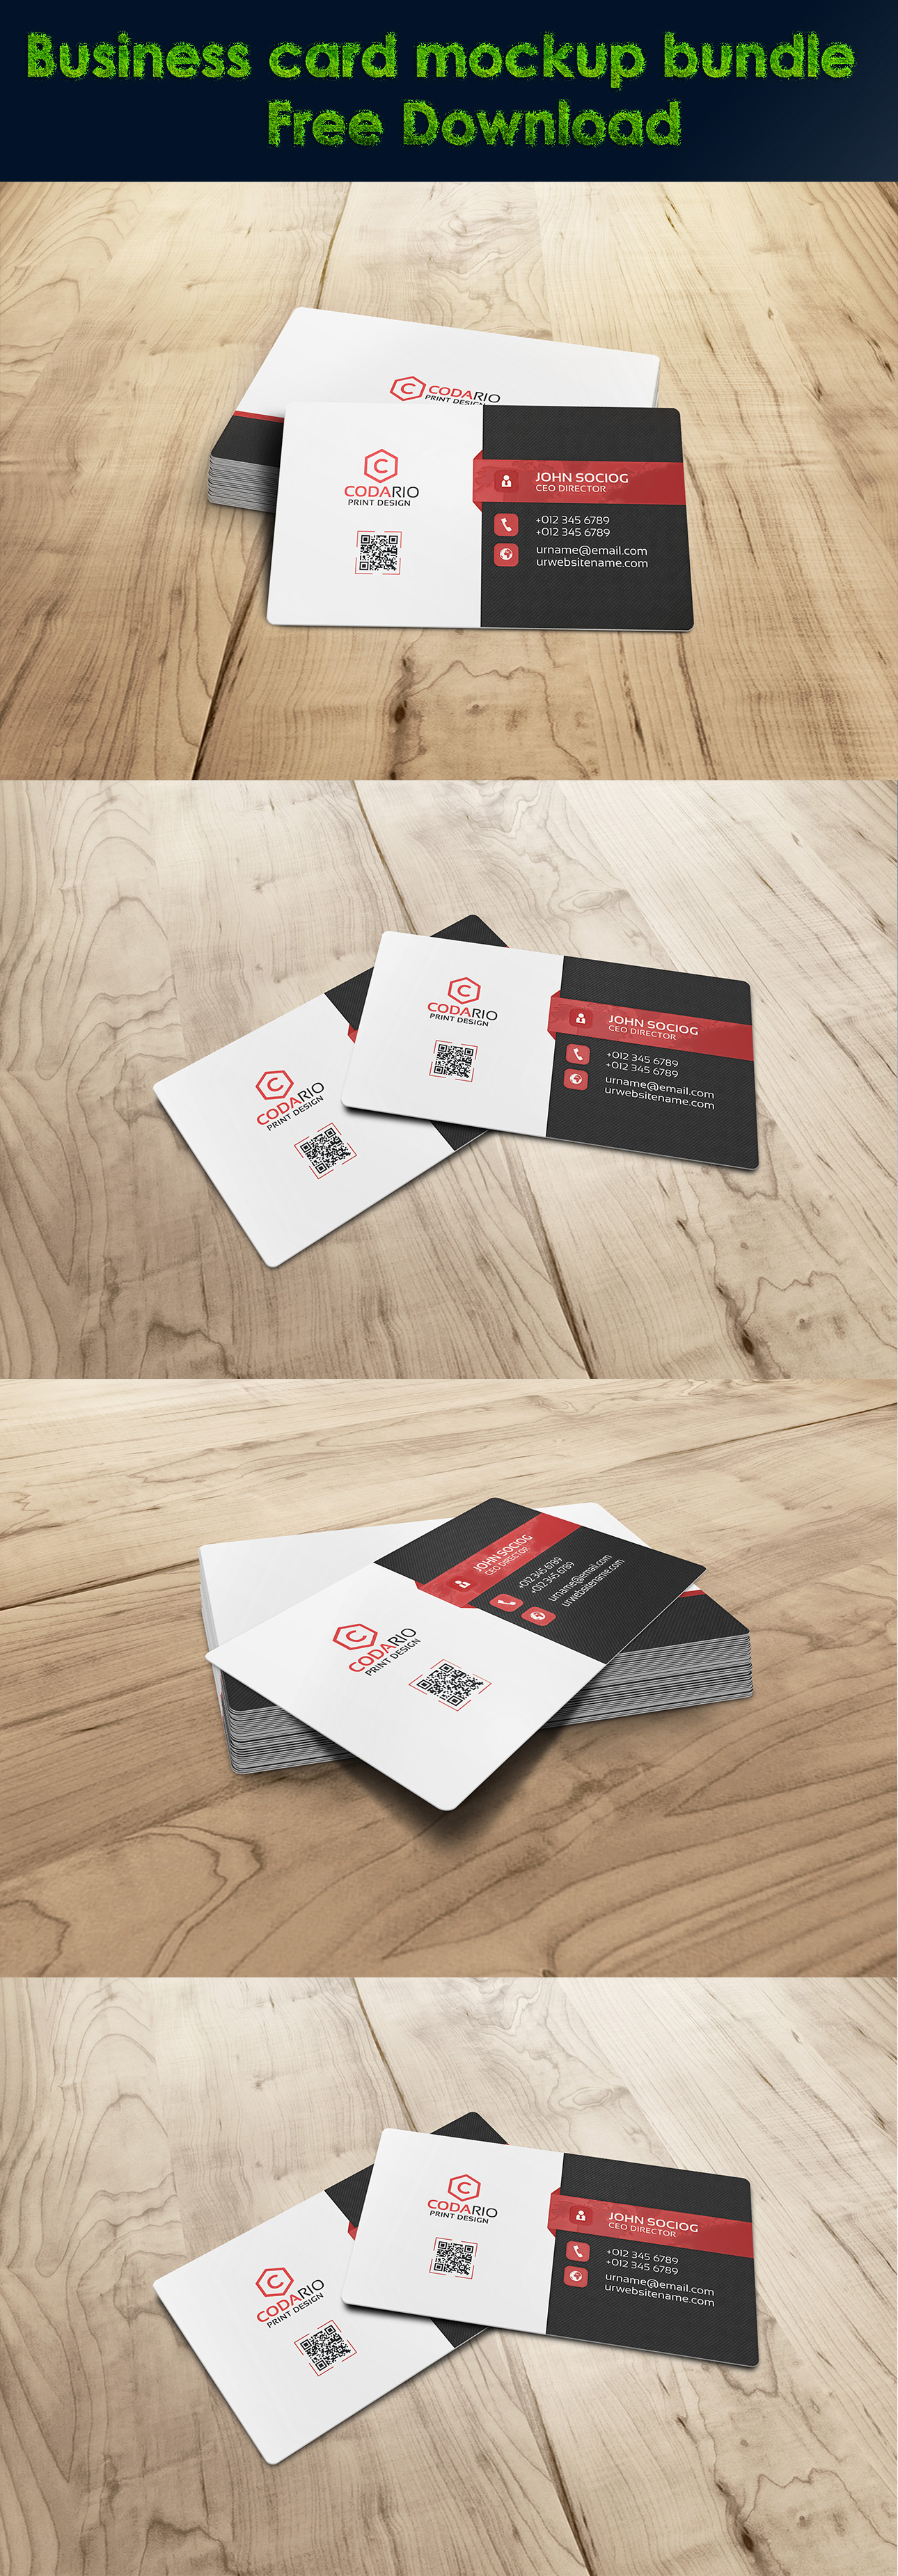 Business card mockup bundle free download on behance reheart Images